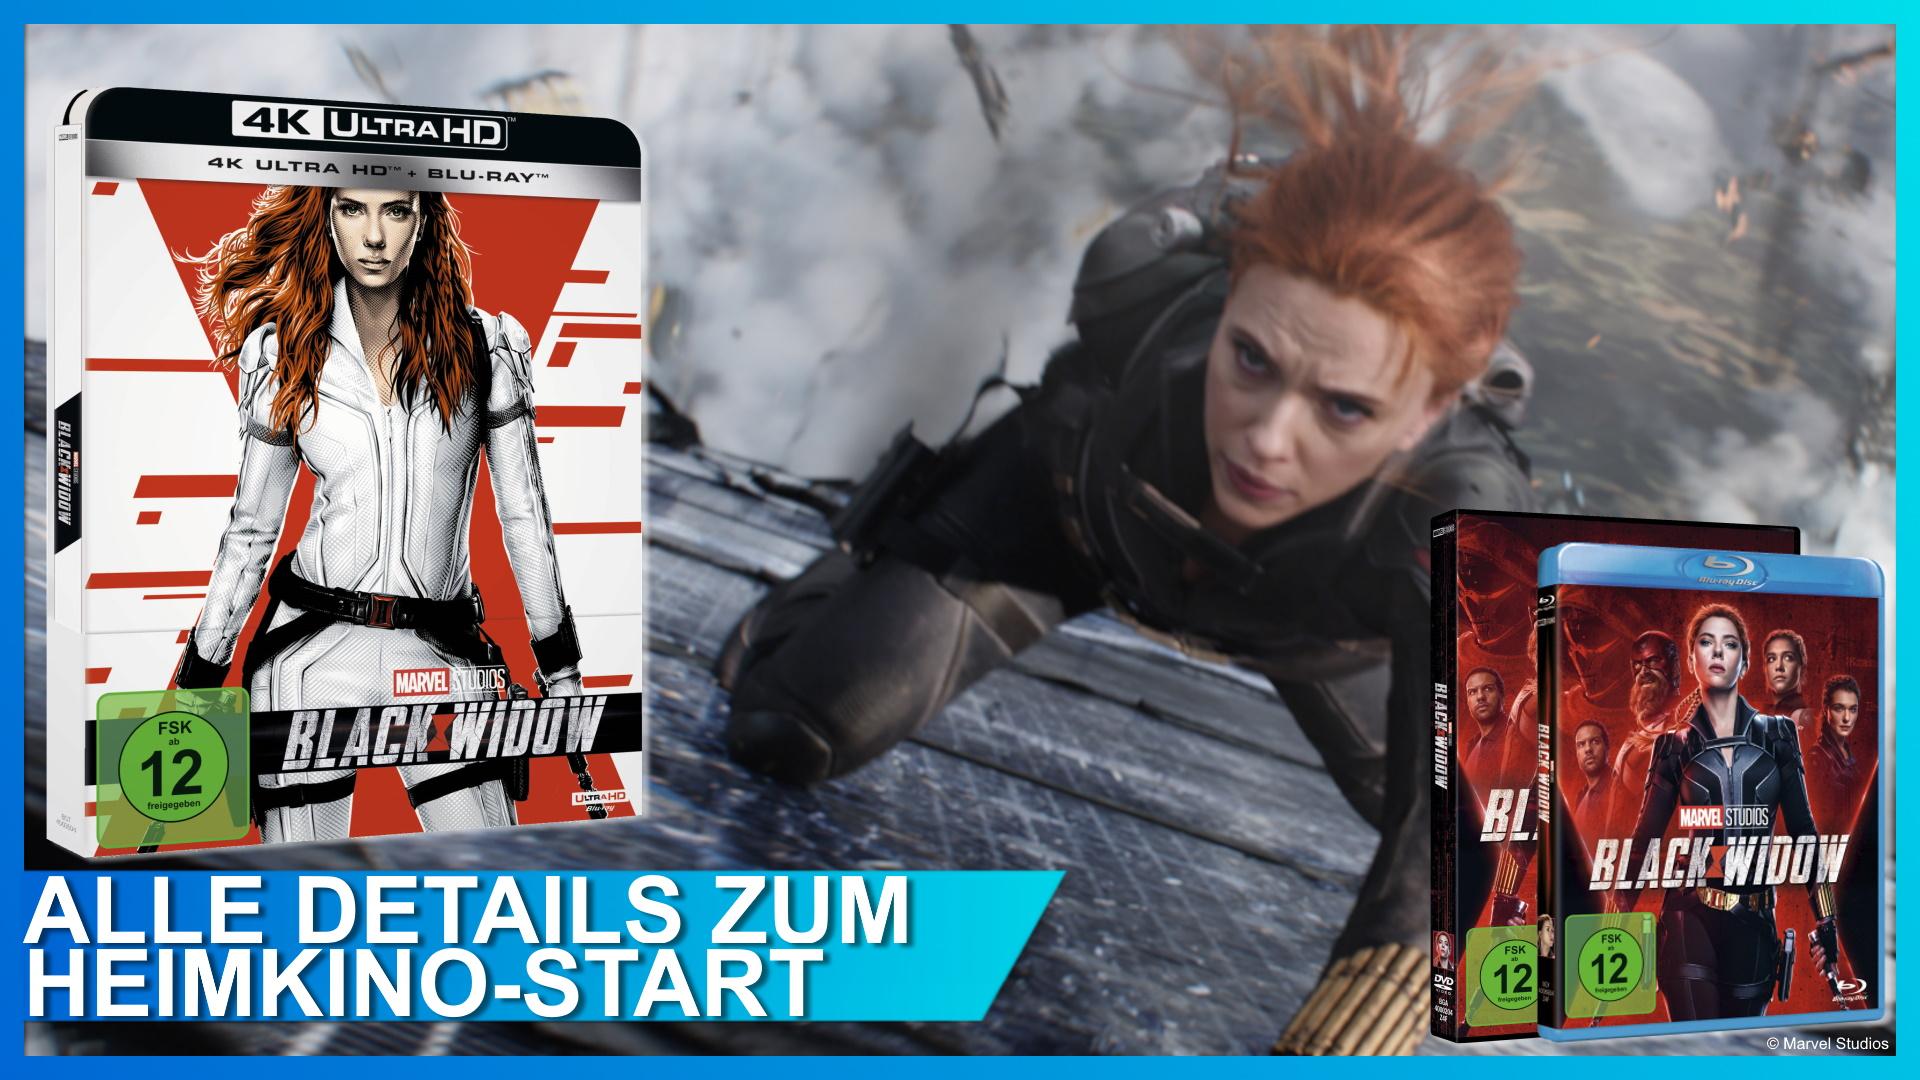 Black Widow Heimkino DVD und Blu-ray